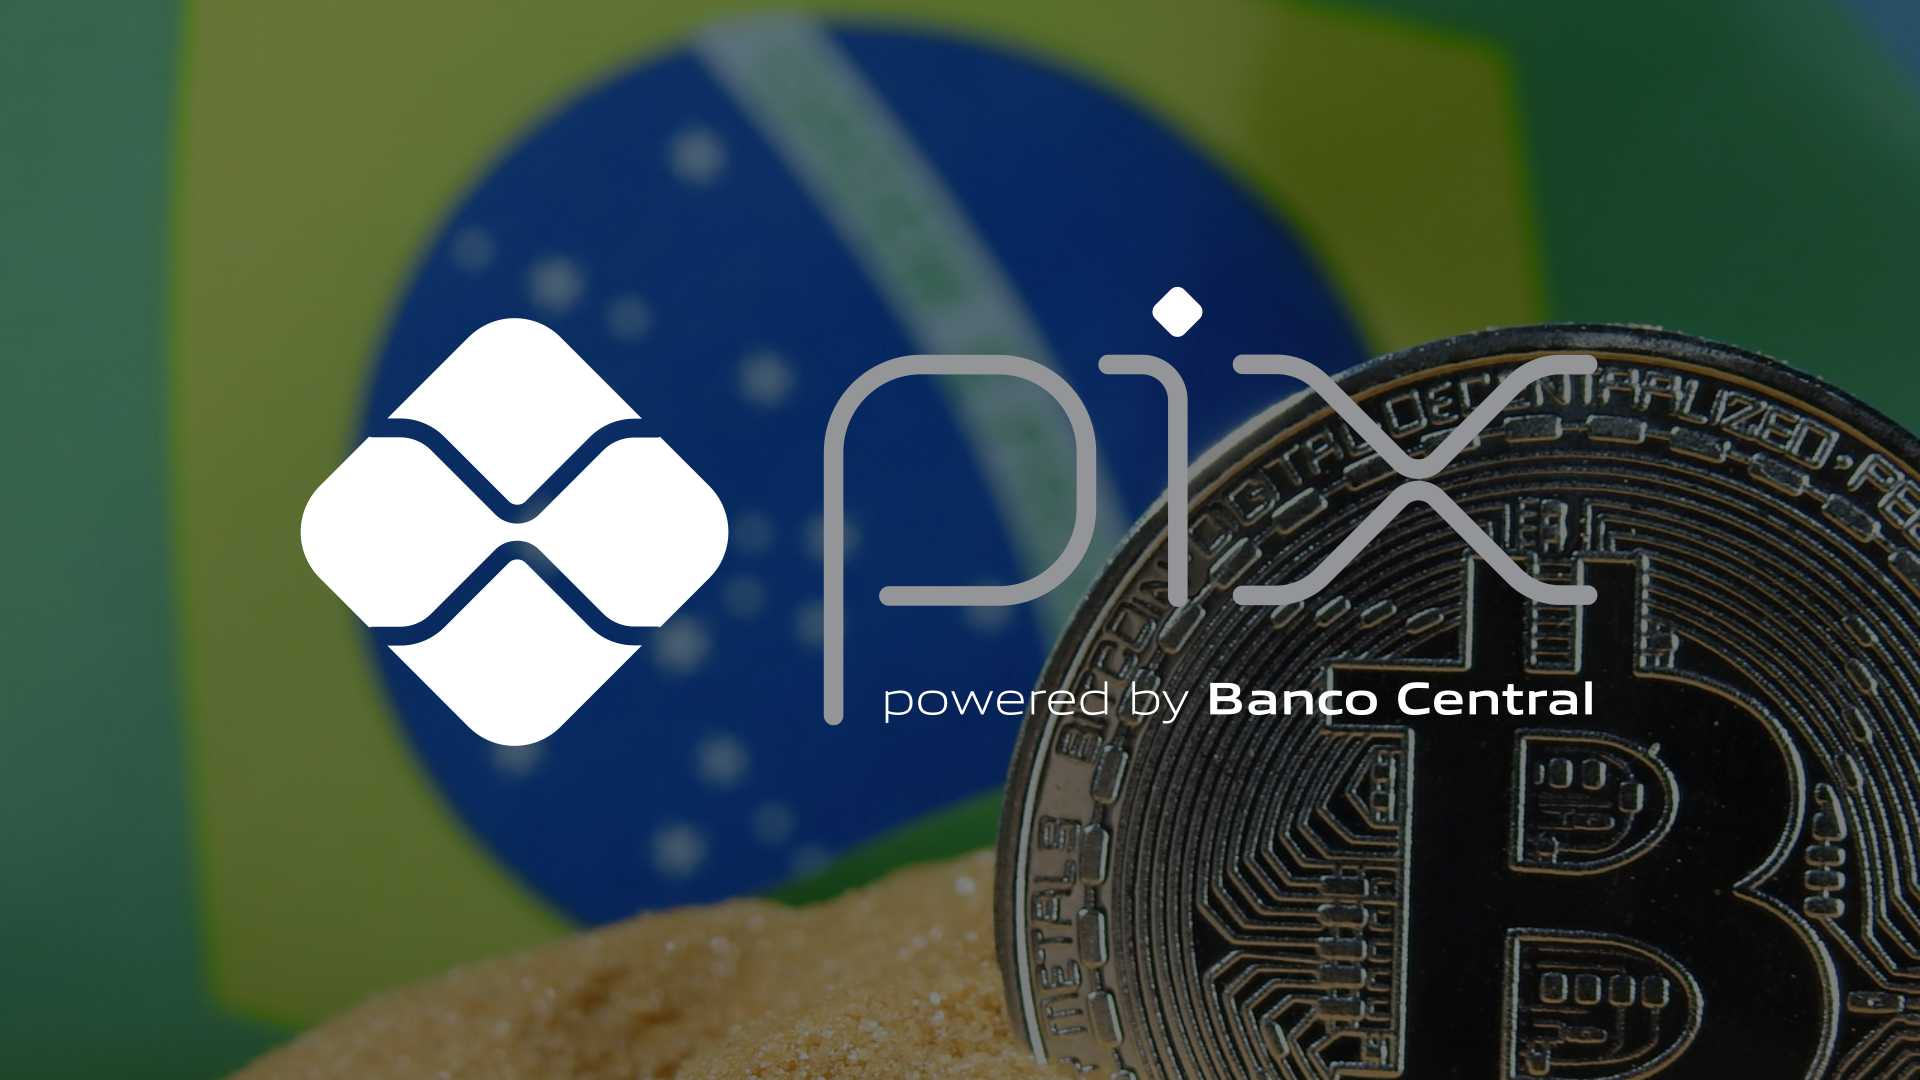 O que é o PIX e o que isso muda no mercado cripto